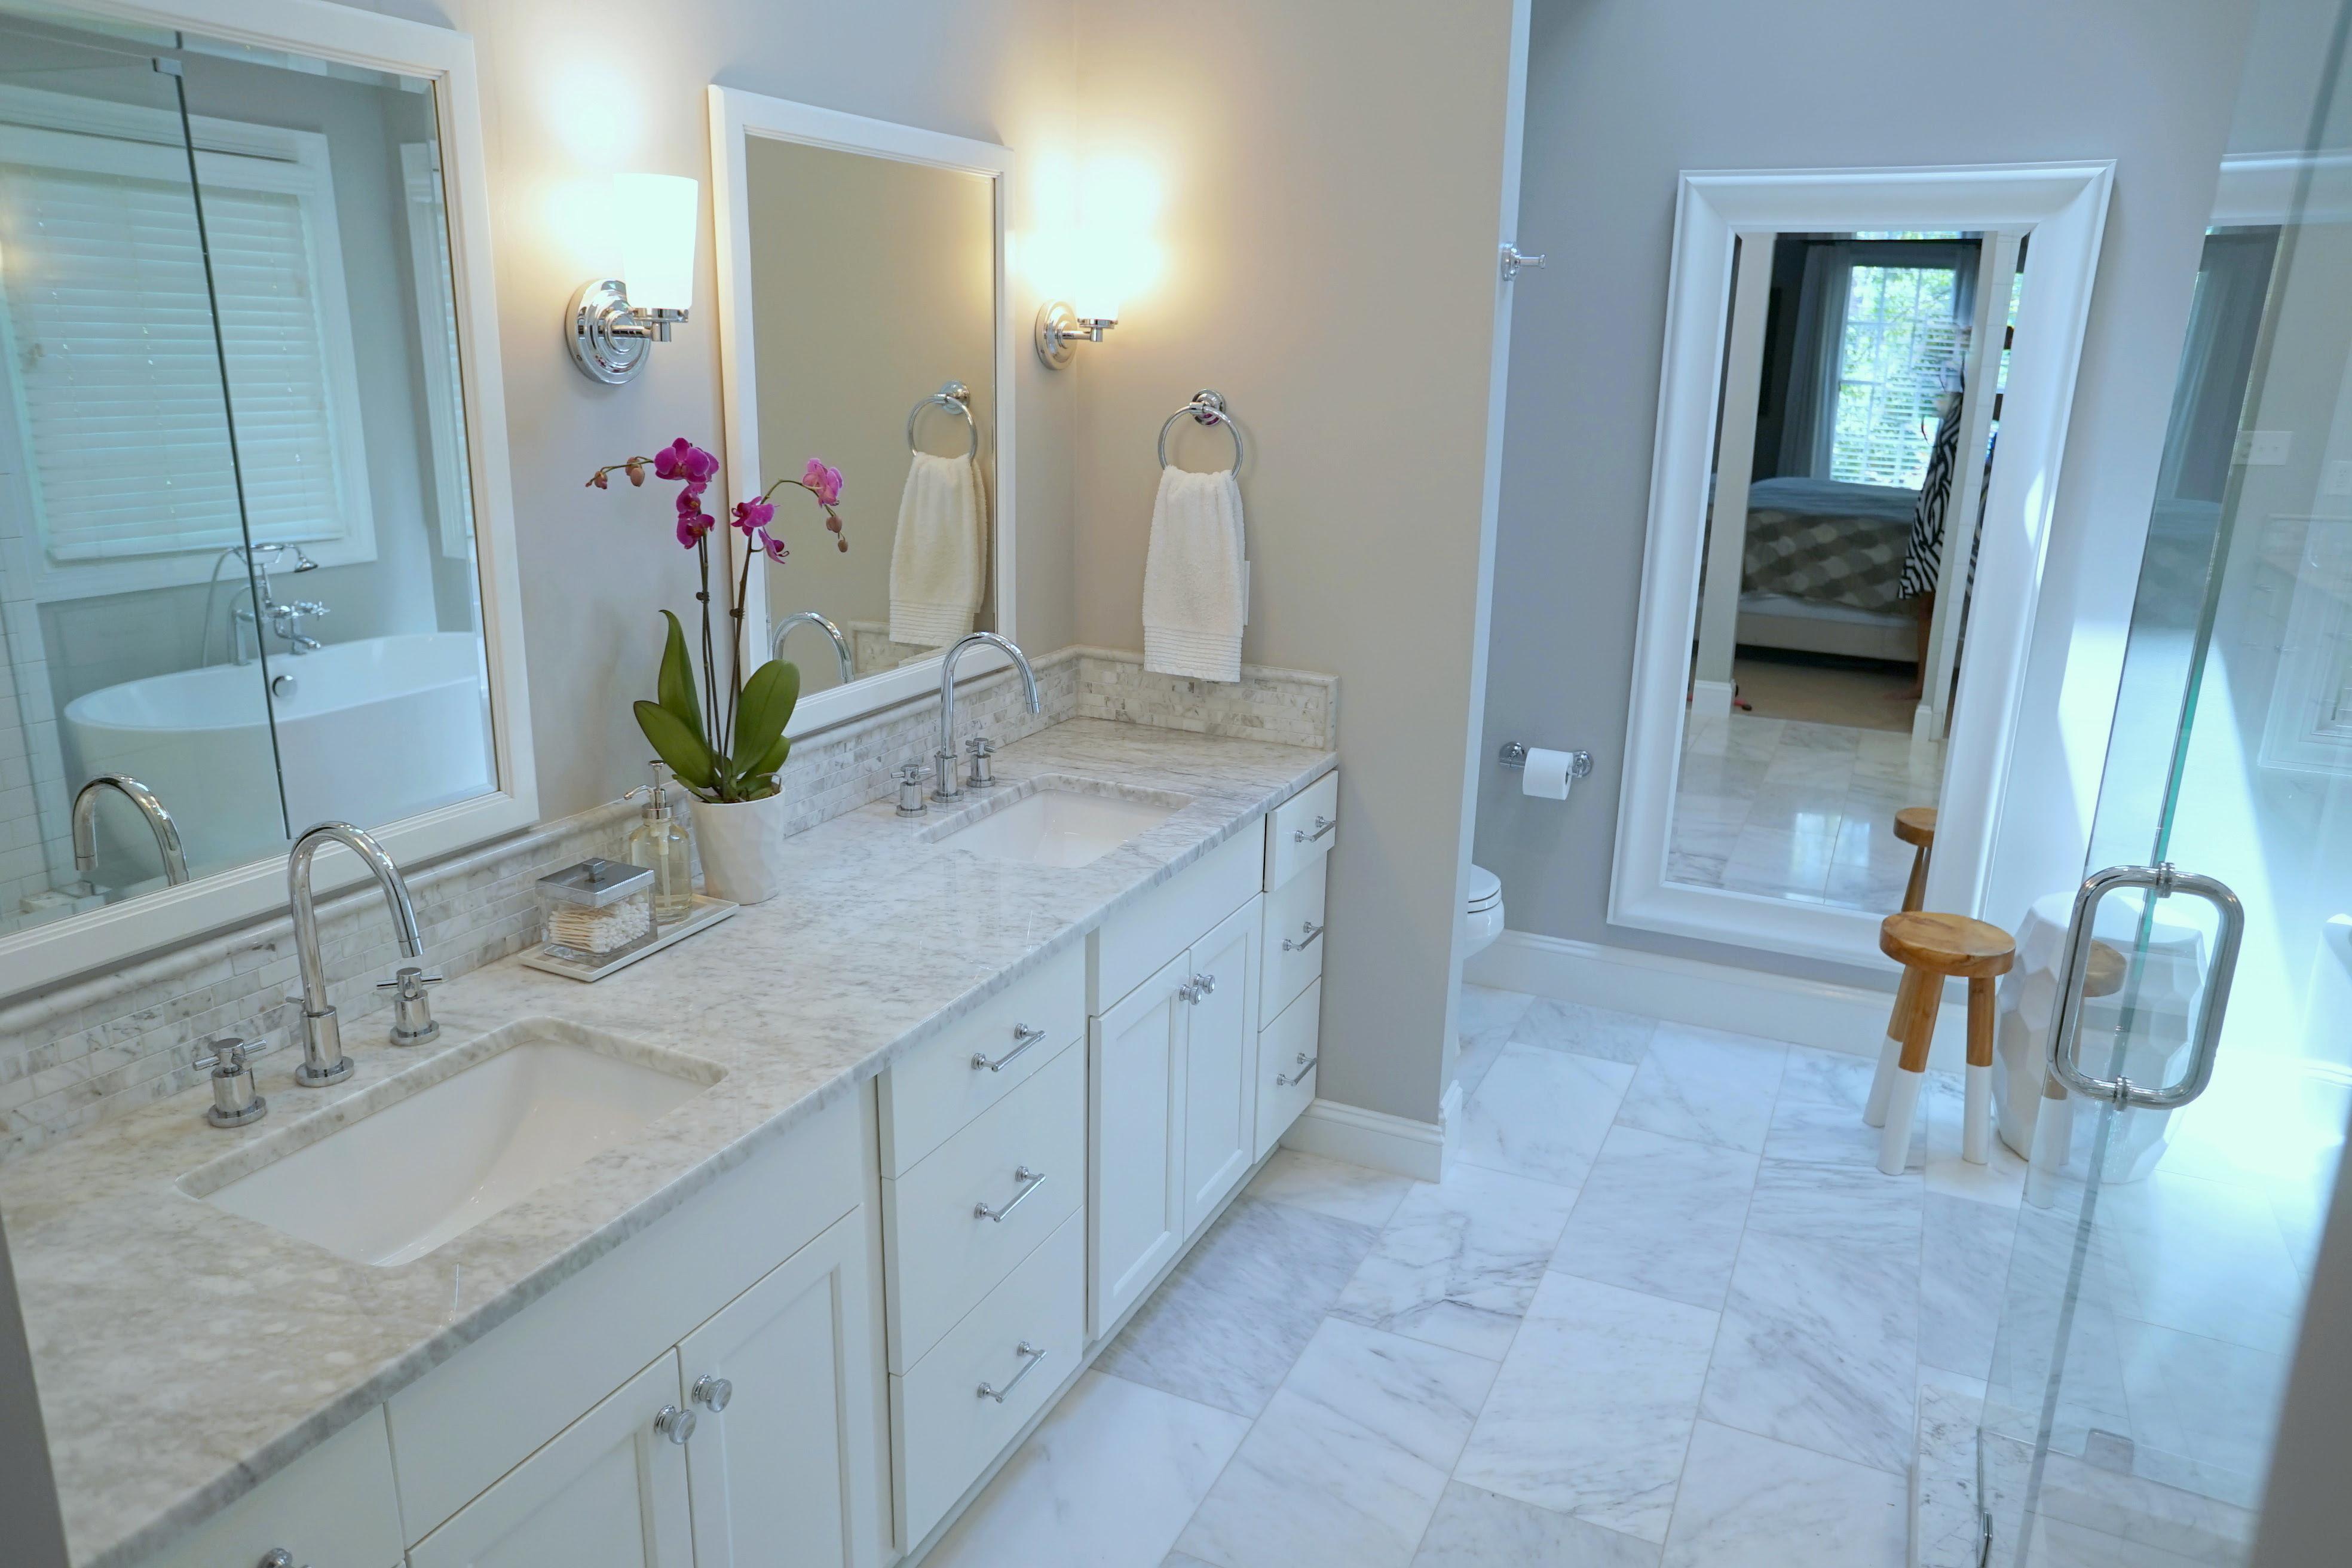 Bathroom Remodeling Pictures | TrendMark Inc.